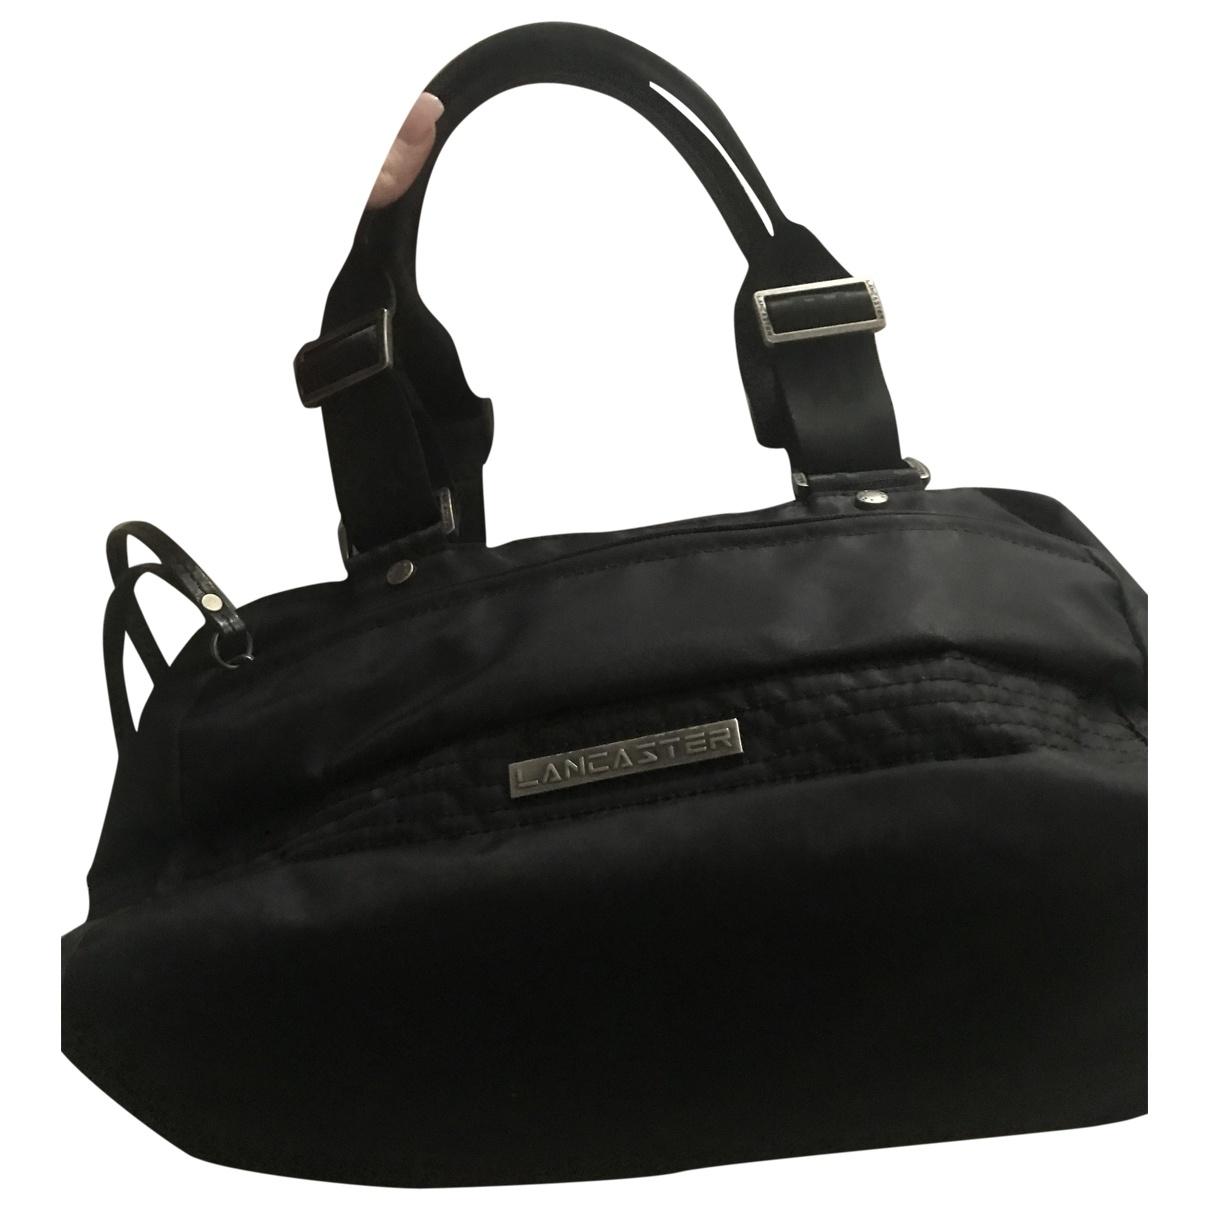 Lancaster \N Handtasche in  Schwarz Synthetik